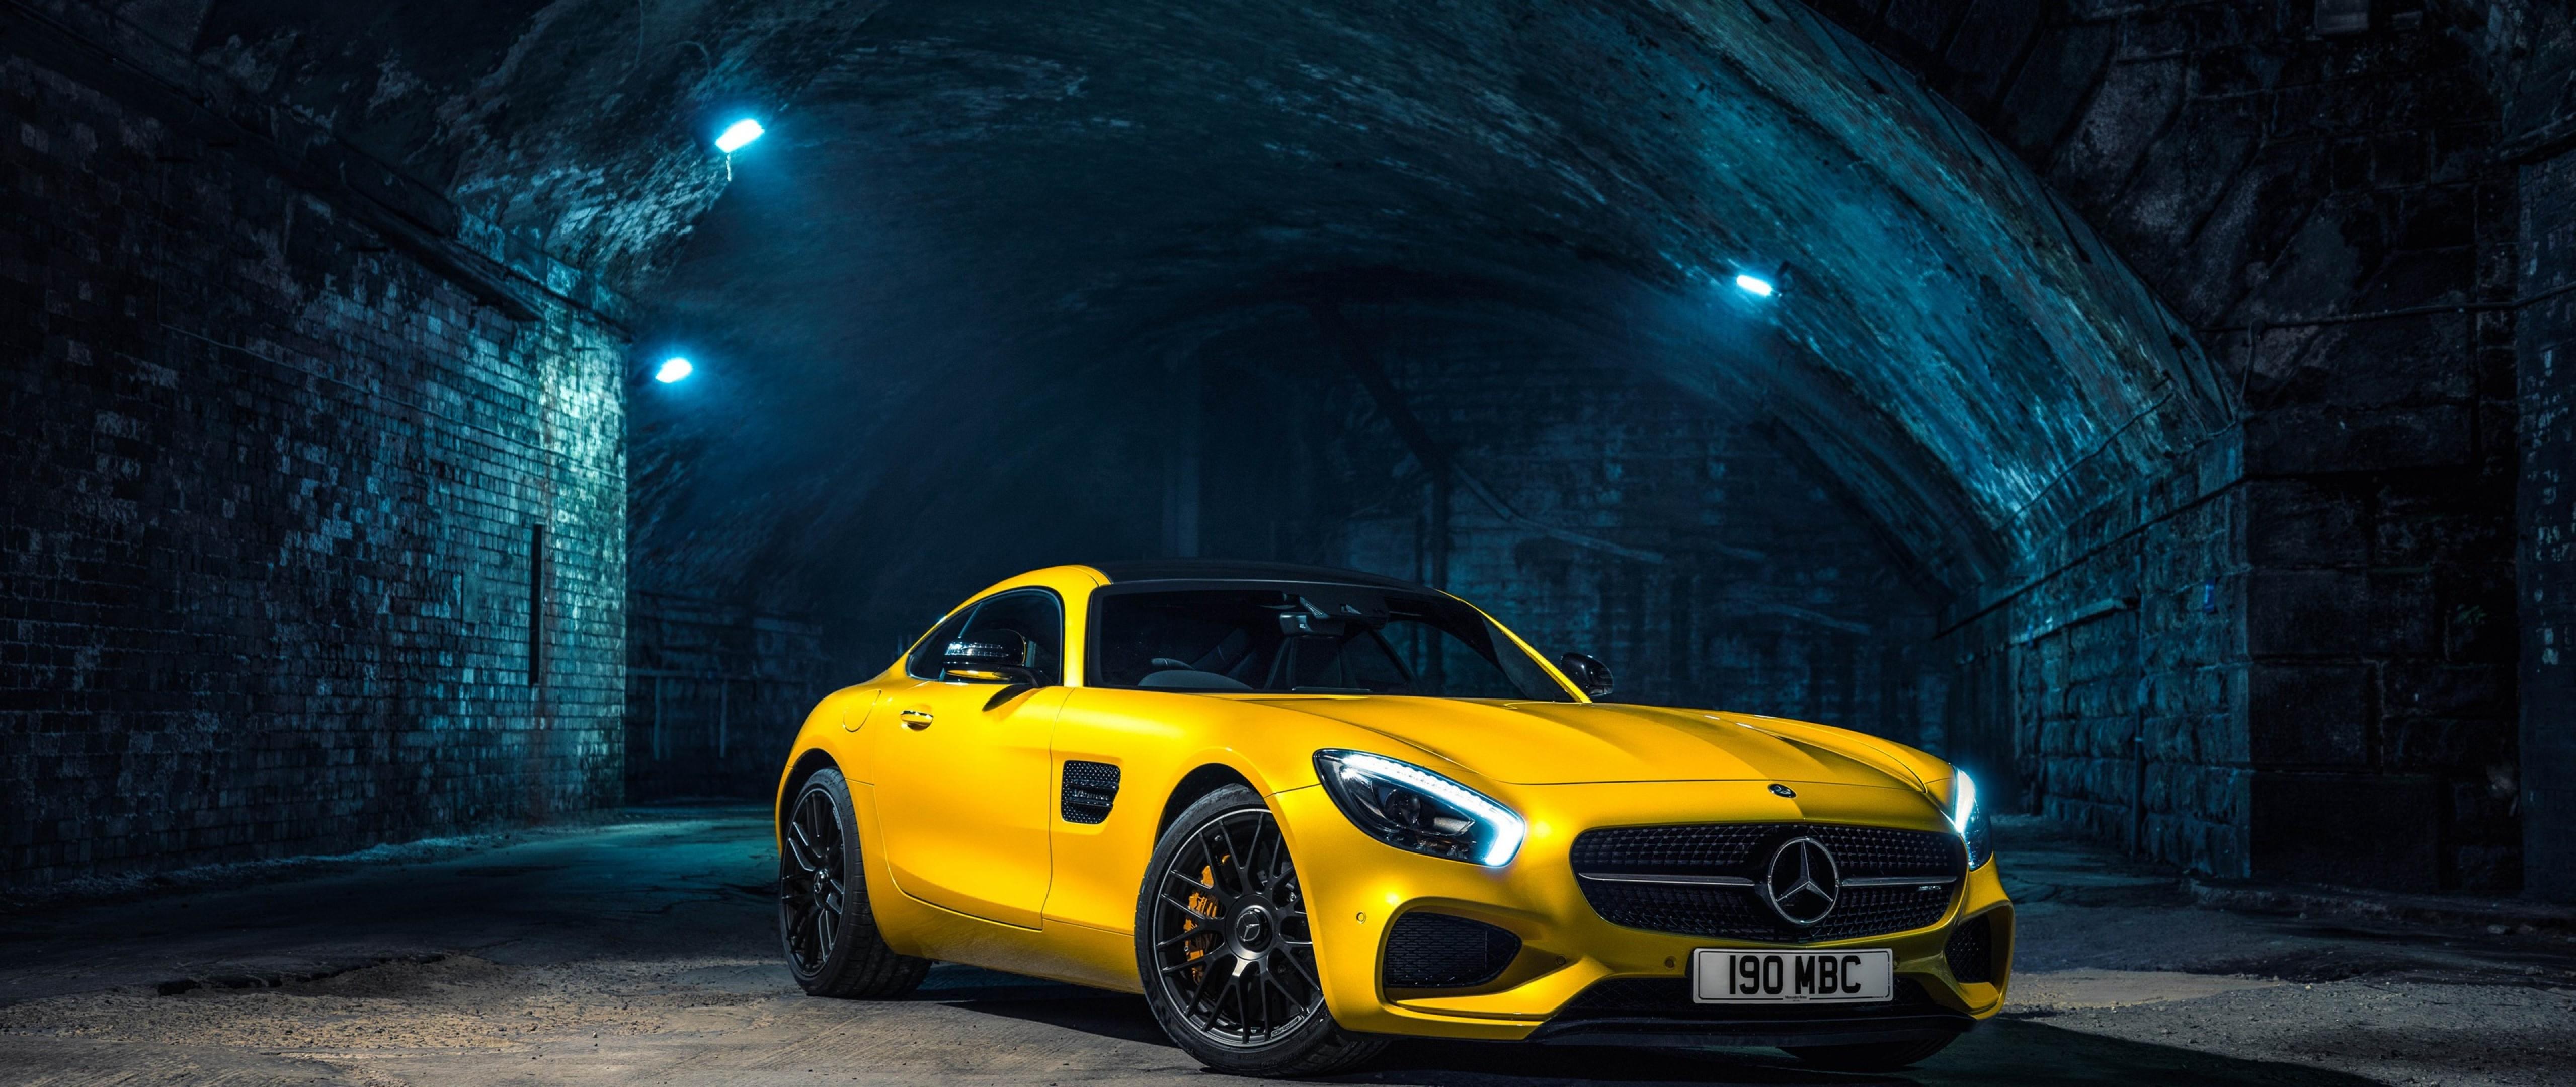 Mercedes Benz Amg Gt S Wallpaper For Desktop And Mobiles 4k